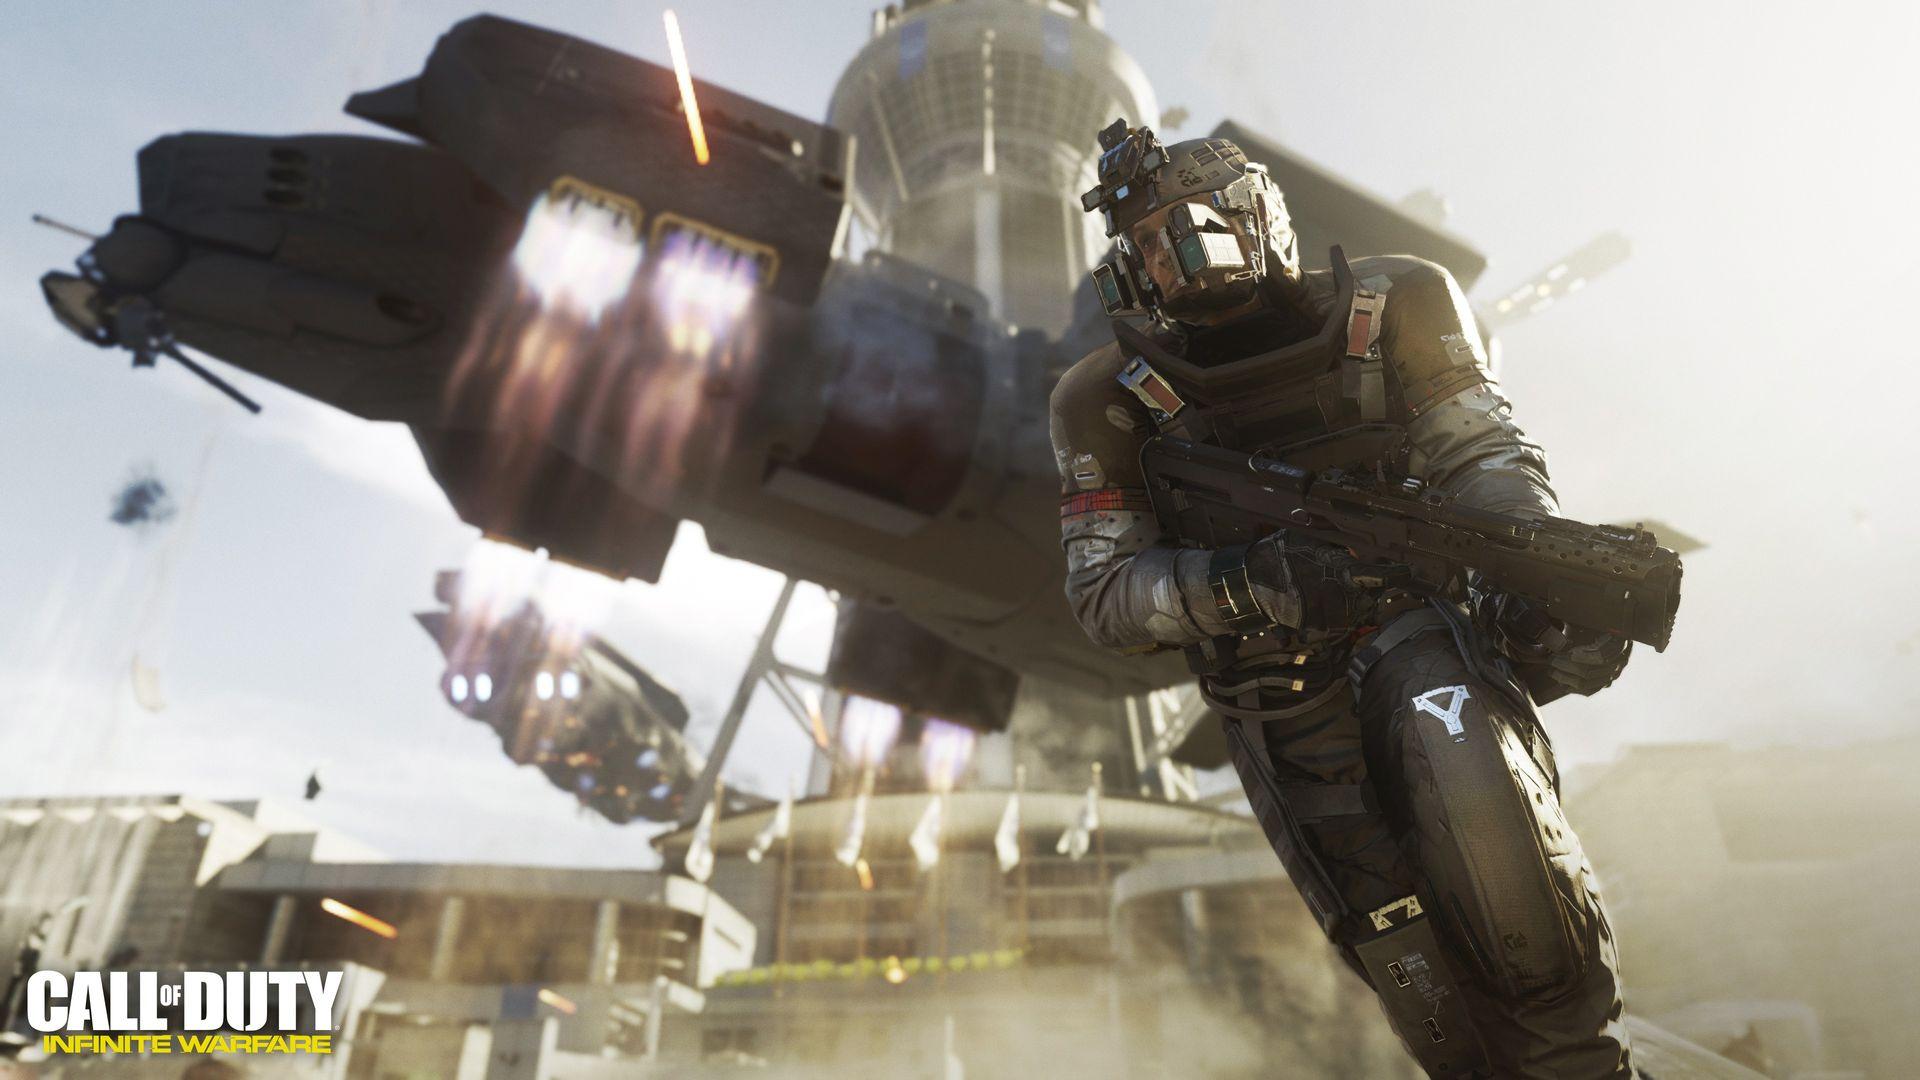 Call-of-Duty-Infinite-Warfare-סיקור החשיפה